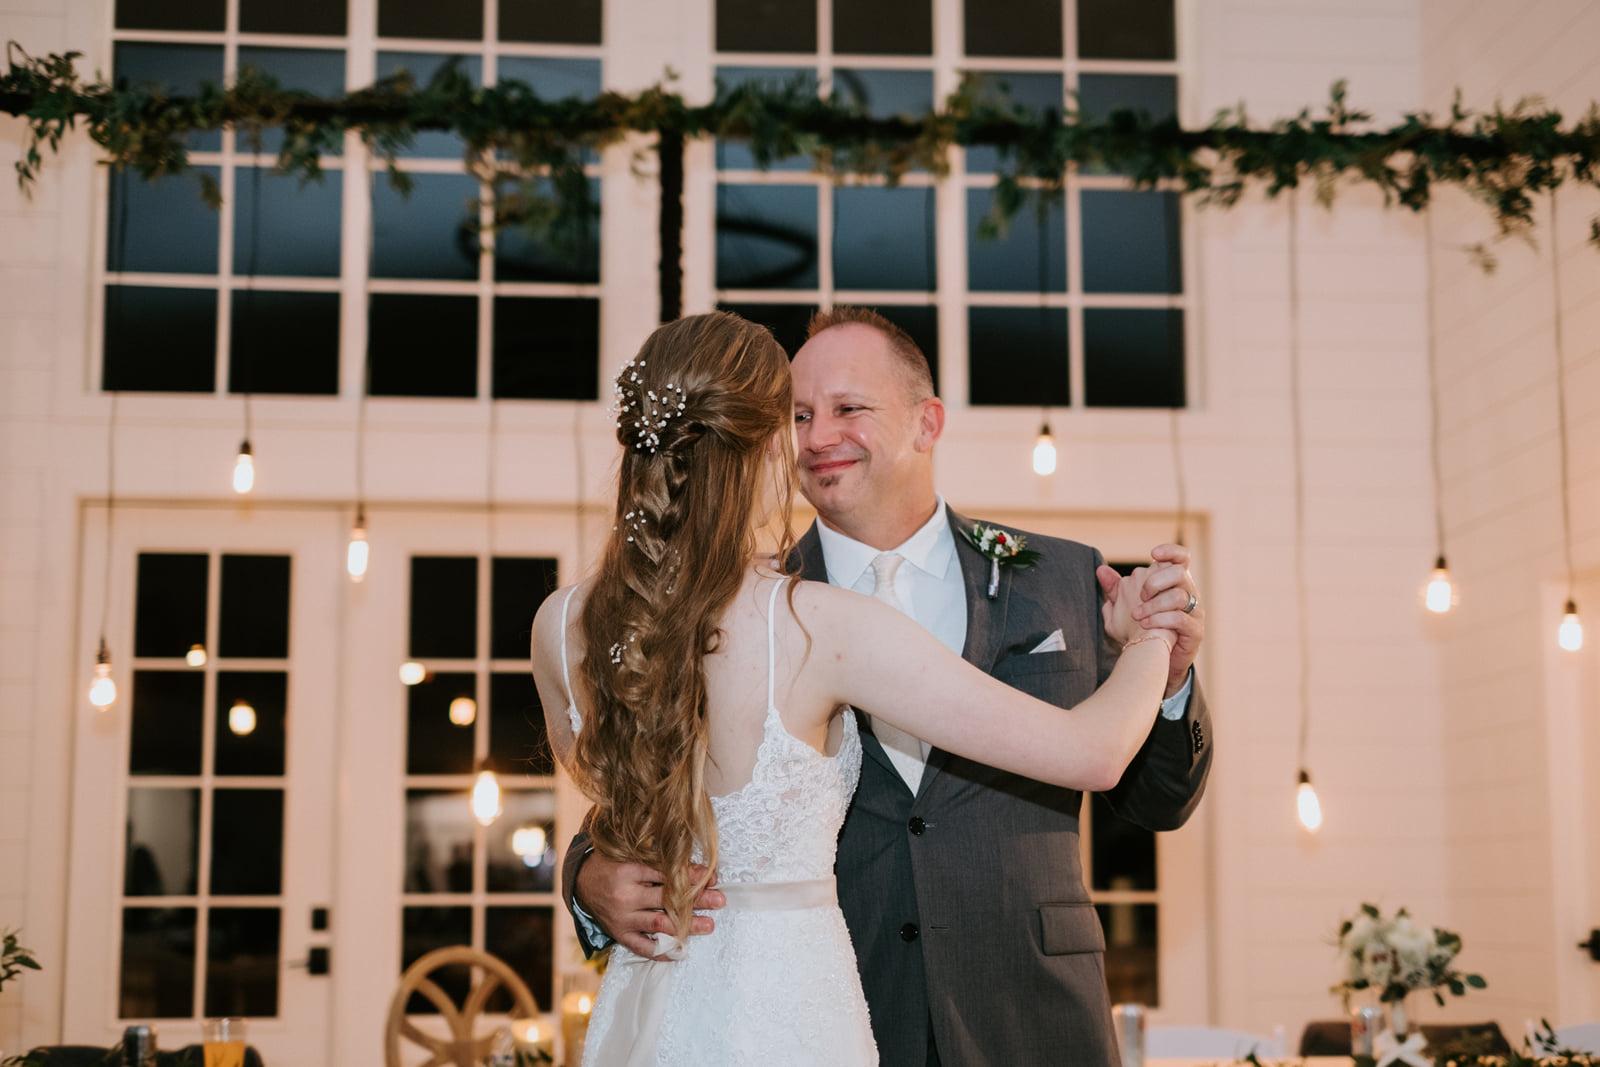 Sanburn Wichita Wedding - The Barn at Grace Hill-1088.jpg